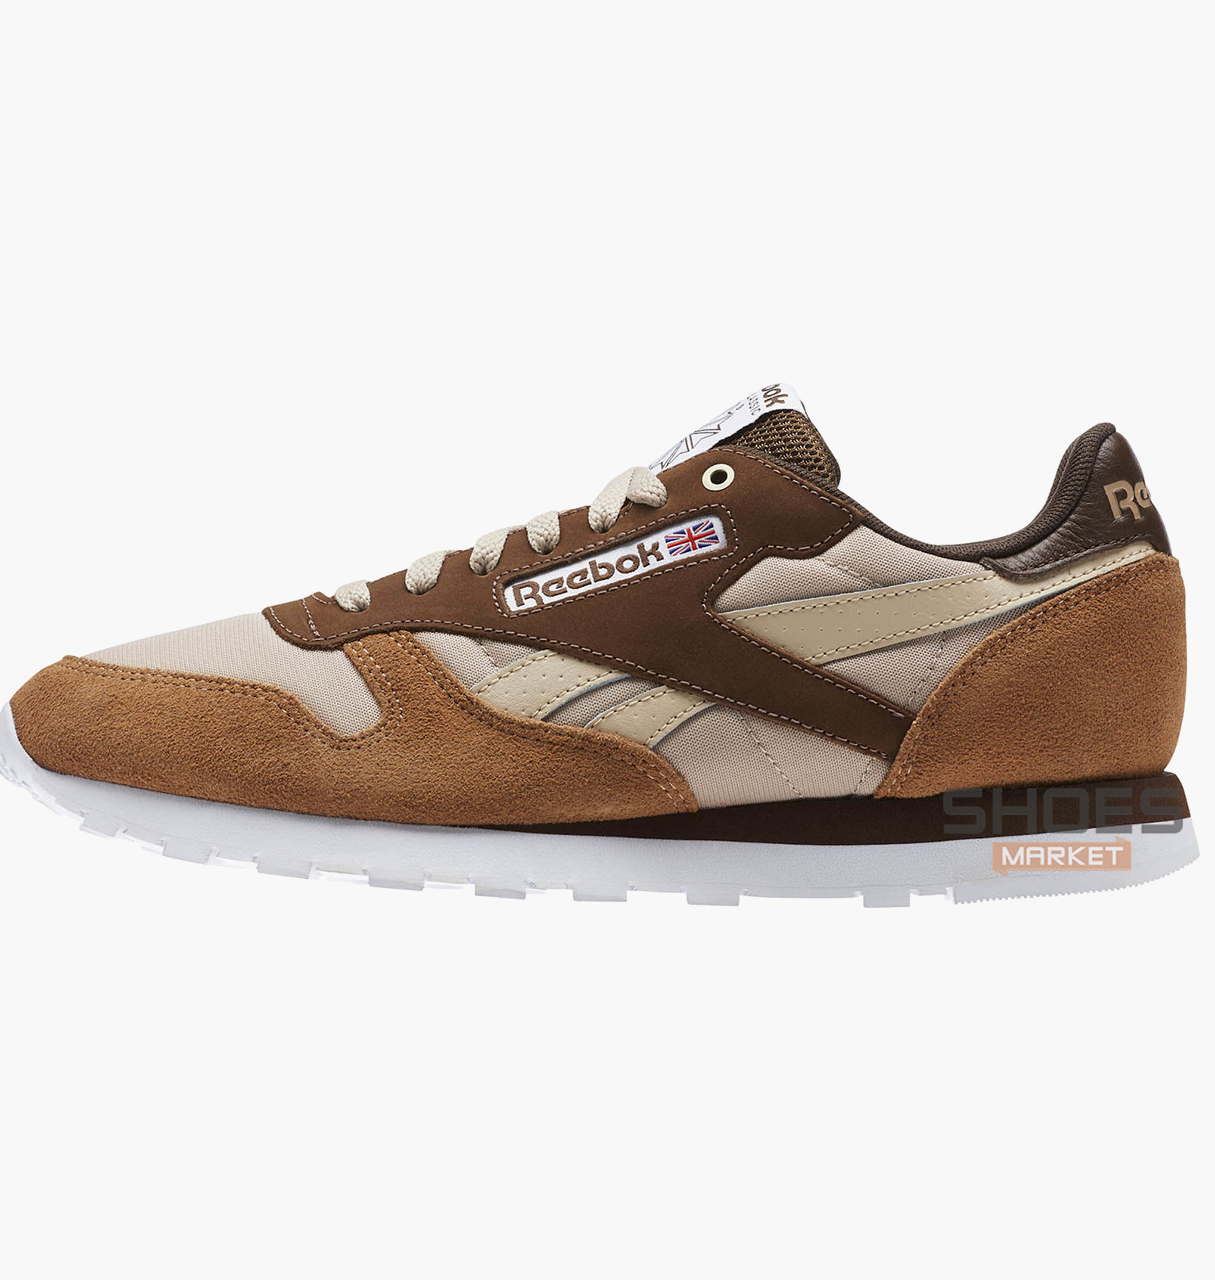 Женские кроссовки Reebok x Montana Cans Classic Leather Brown CM9610, оригинал